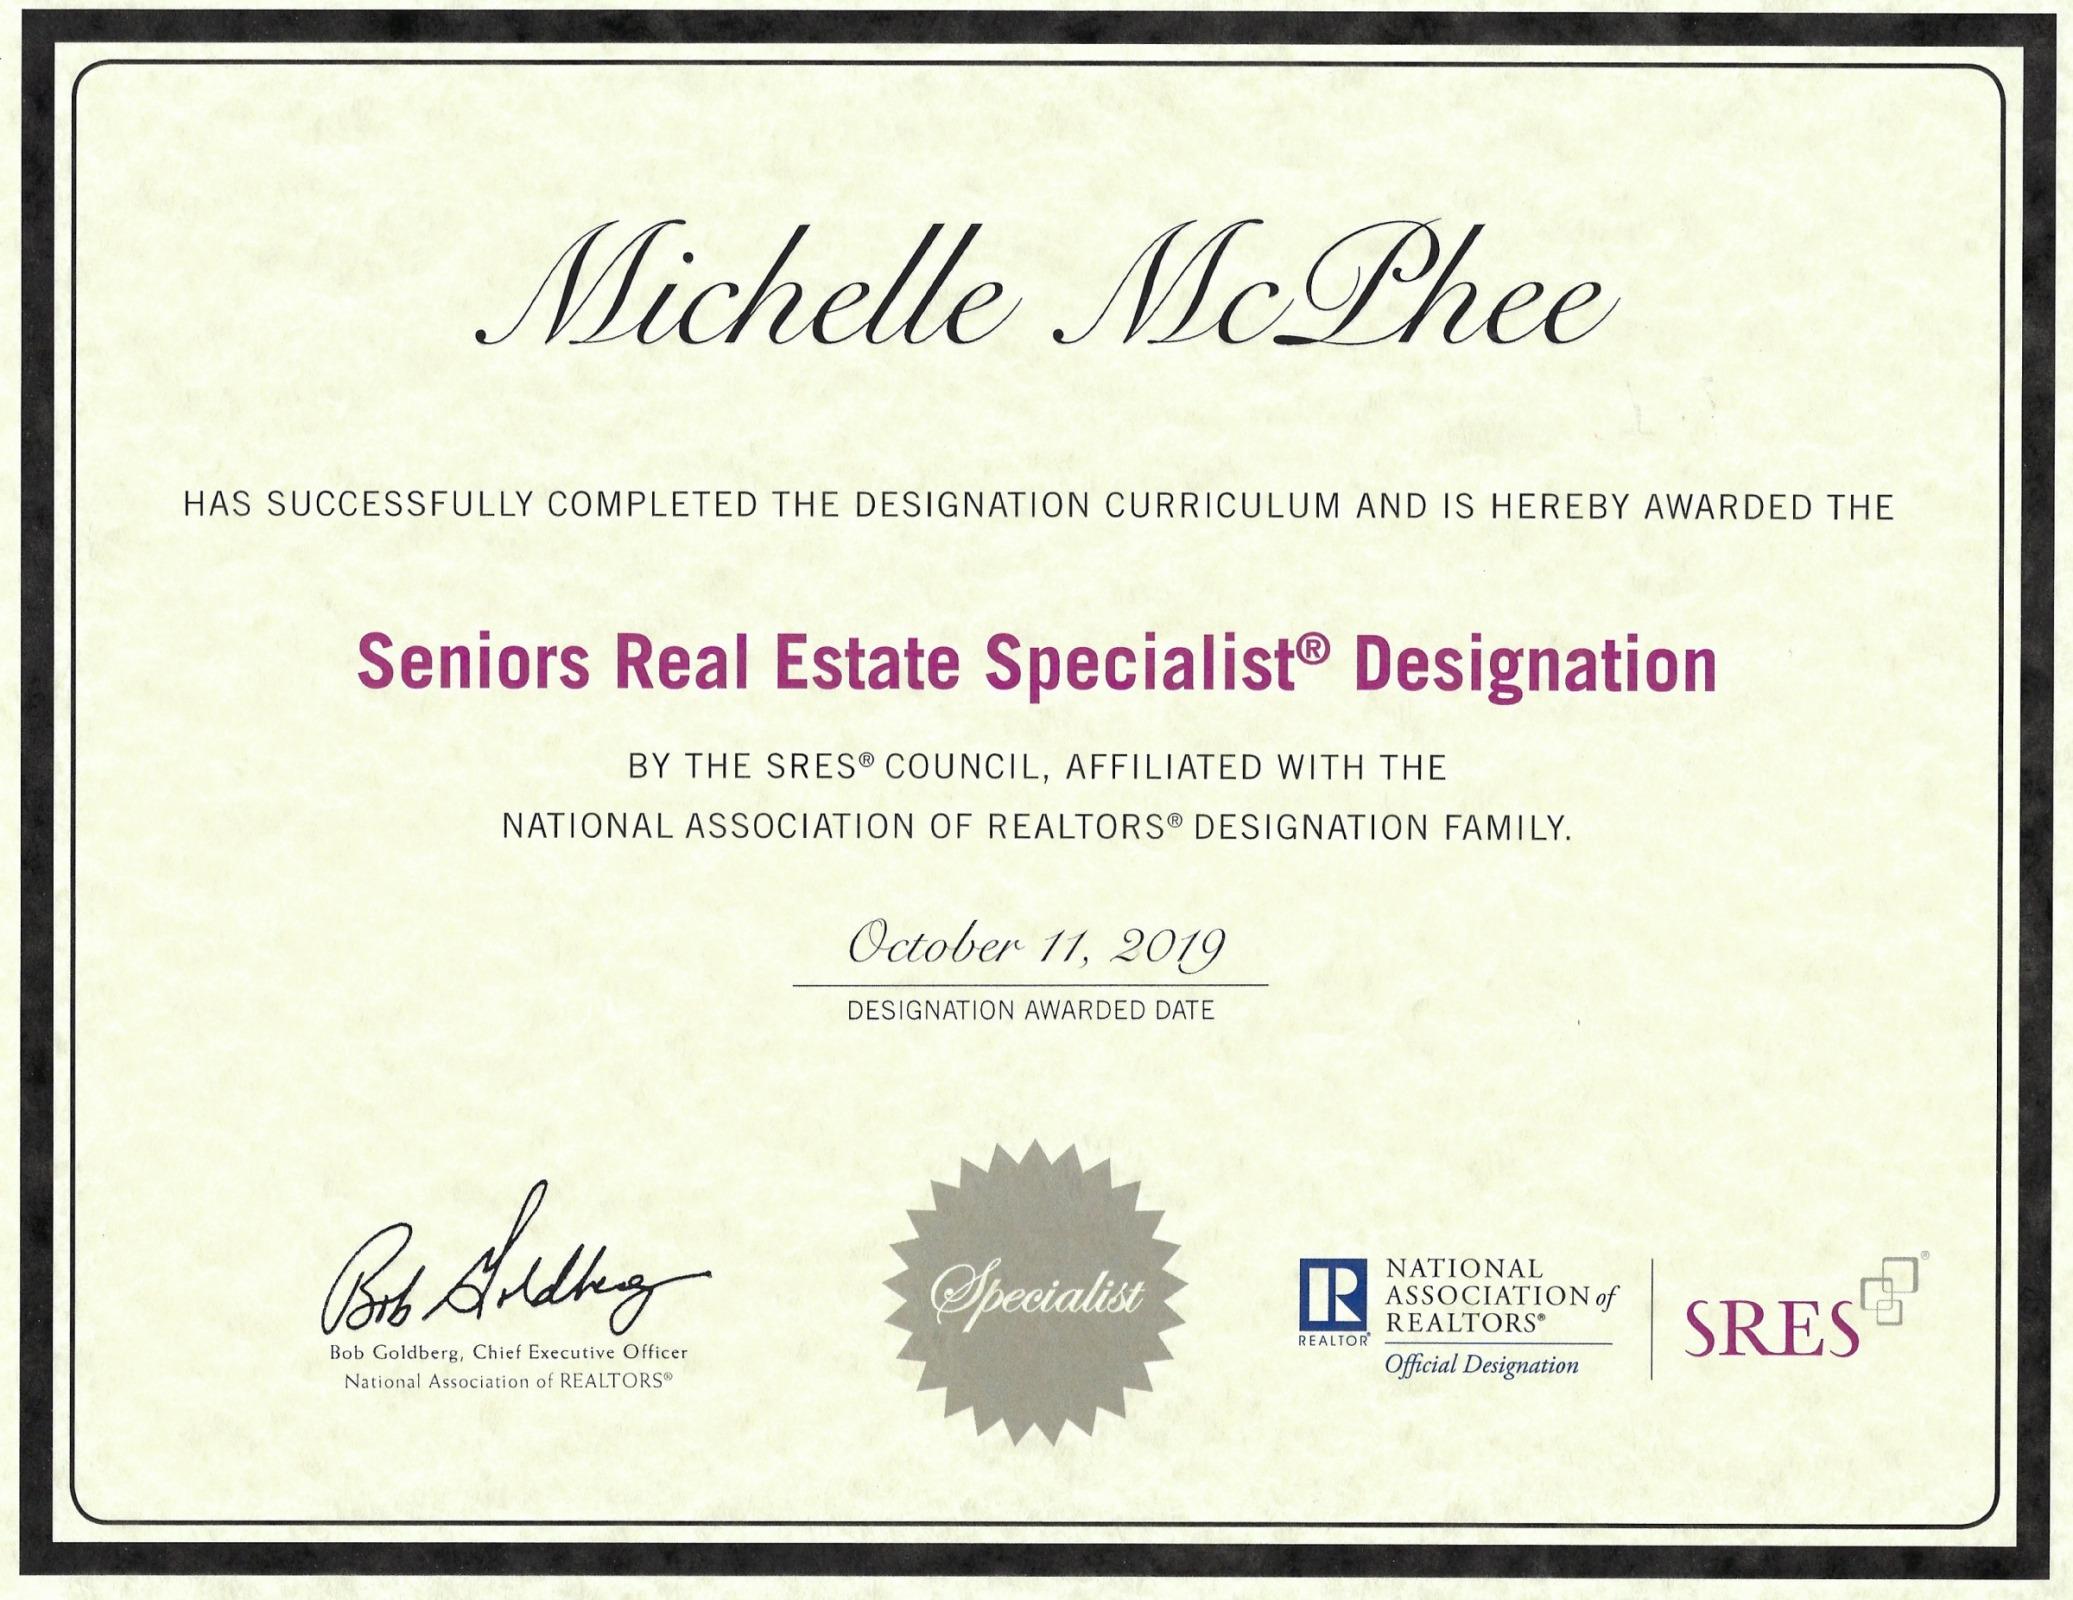 Michelle McPhee SRES Designation Certificate.jpg